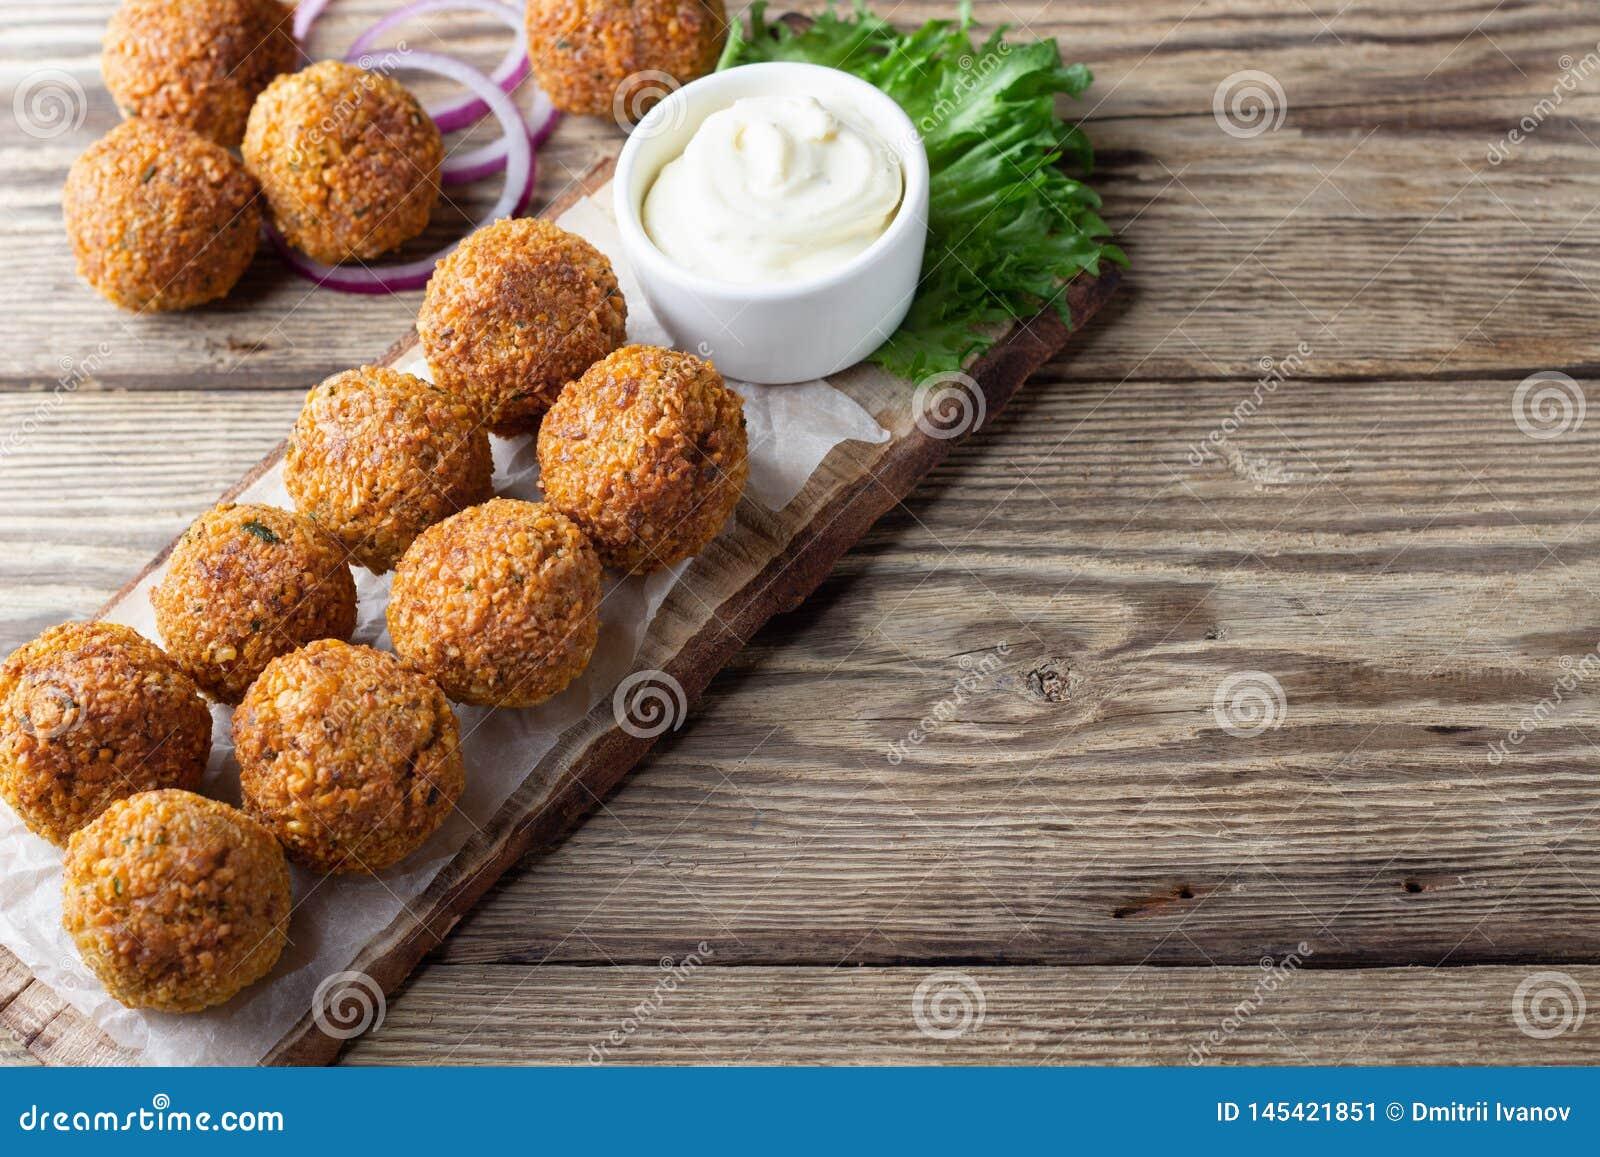 Vegetarian chickpeas falafel balls on wooden rustic board. Traditional arabian food